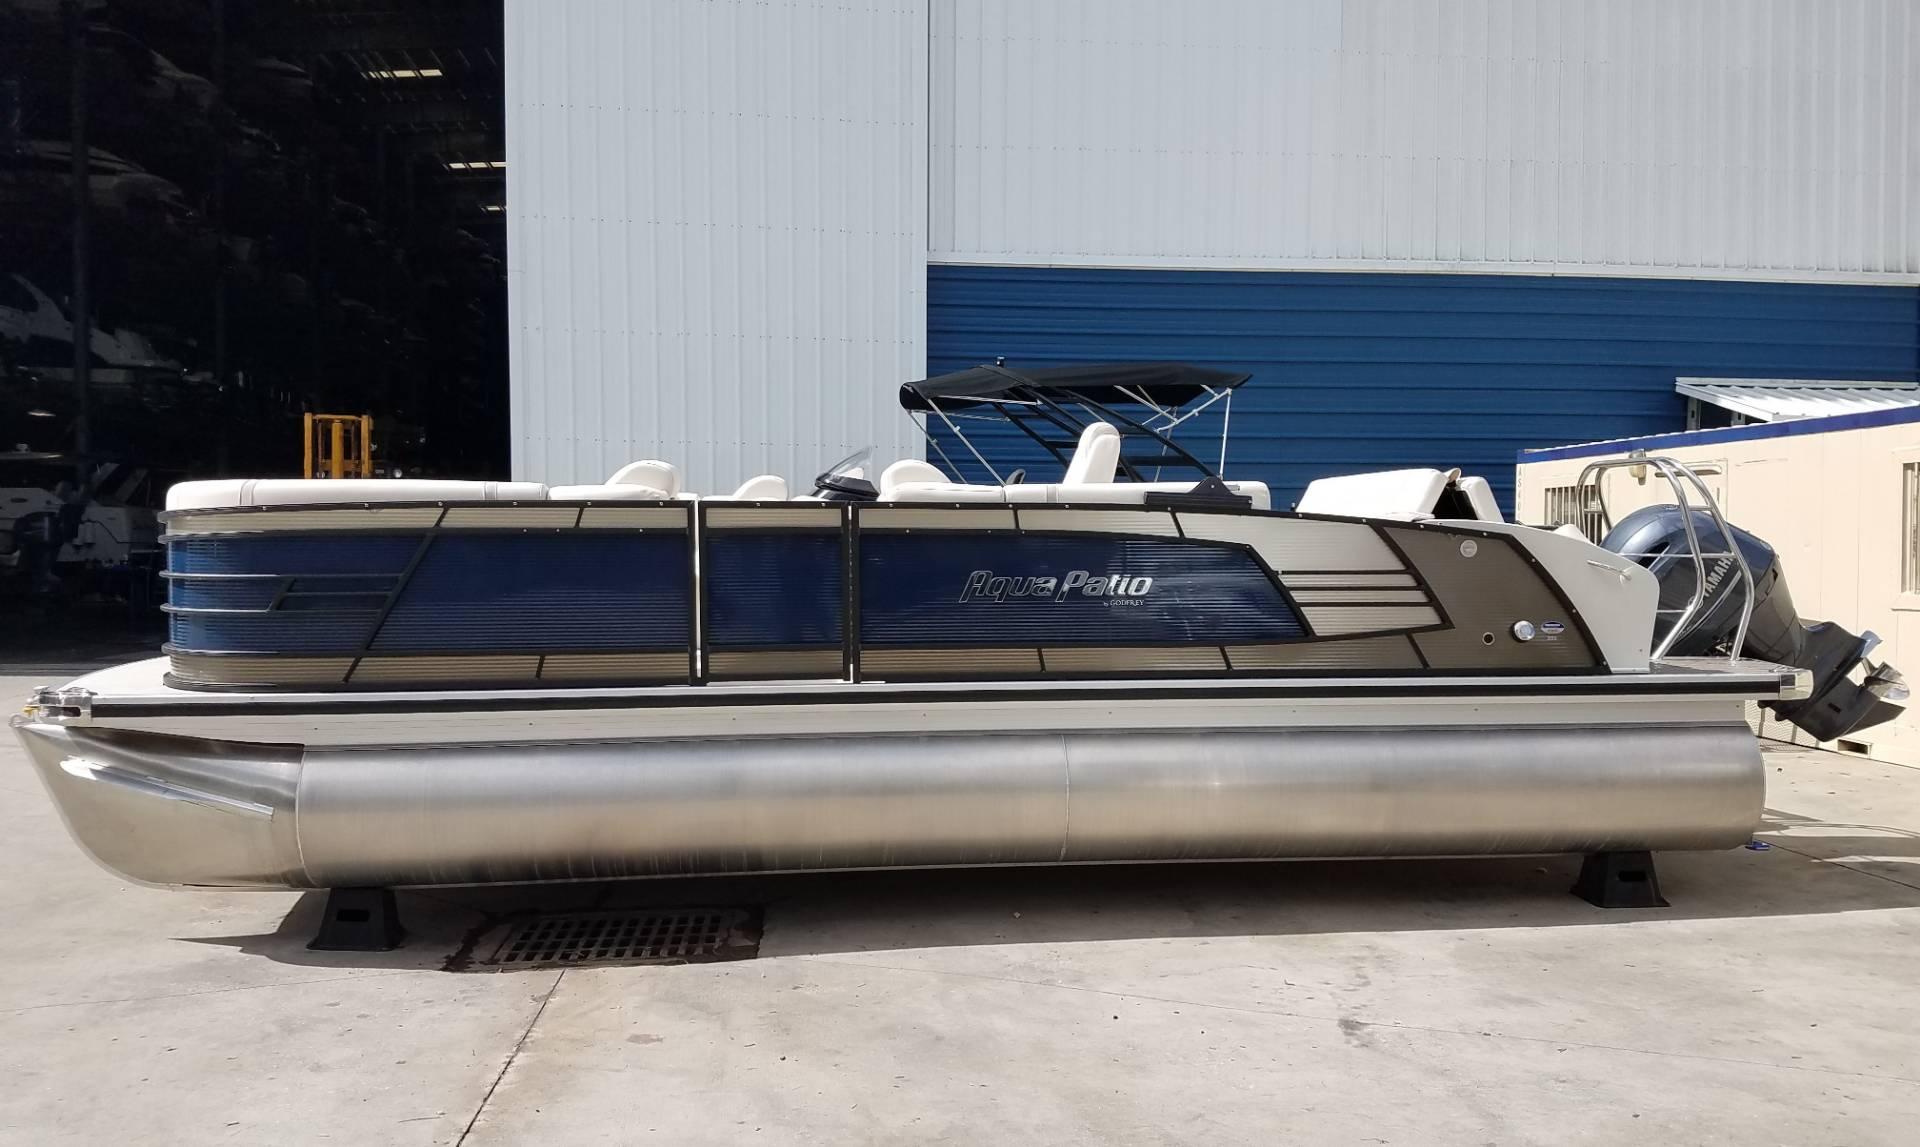 2017 Aqua Patio 255 EL Power Boats Outboard Niceville Florida N